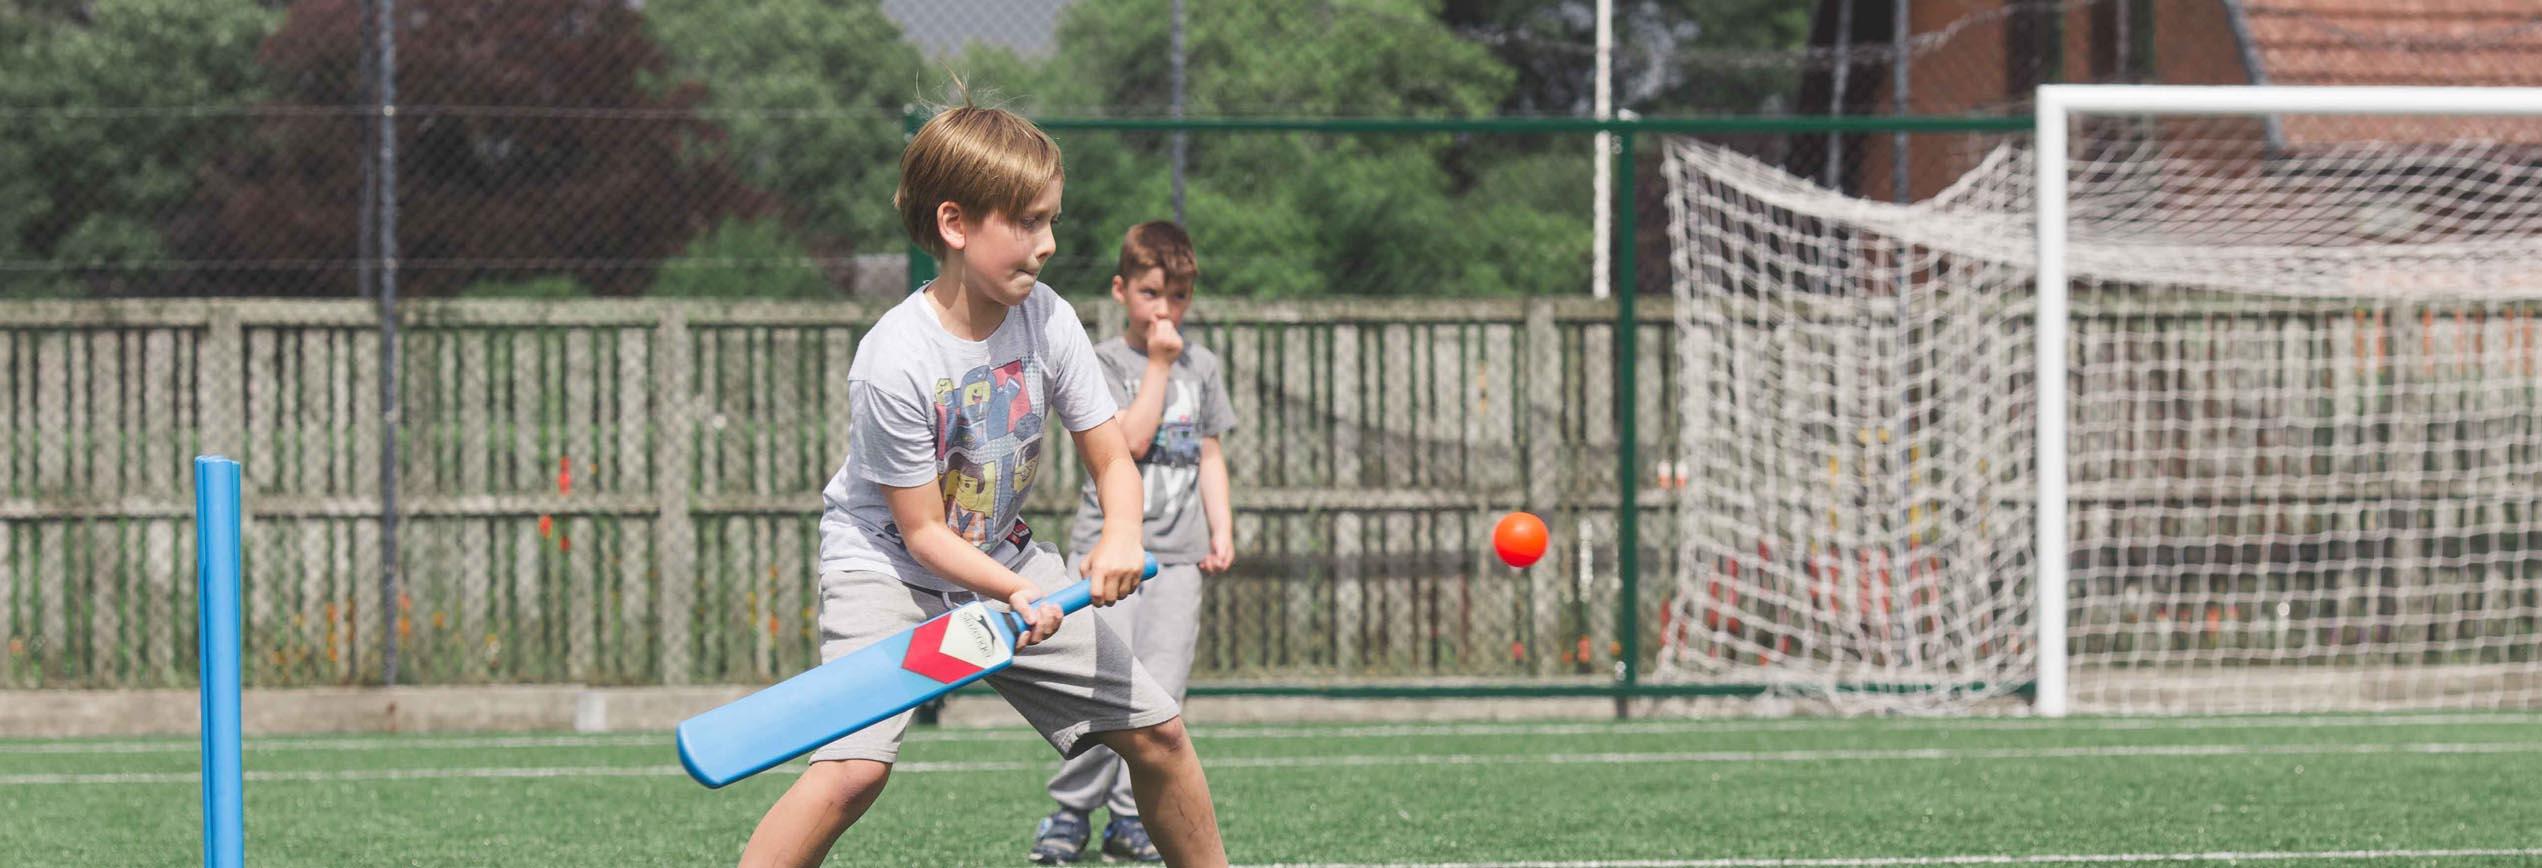 vision coaching sports camp Ayr